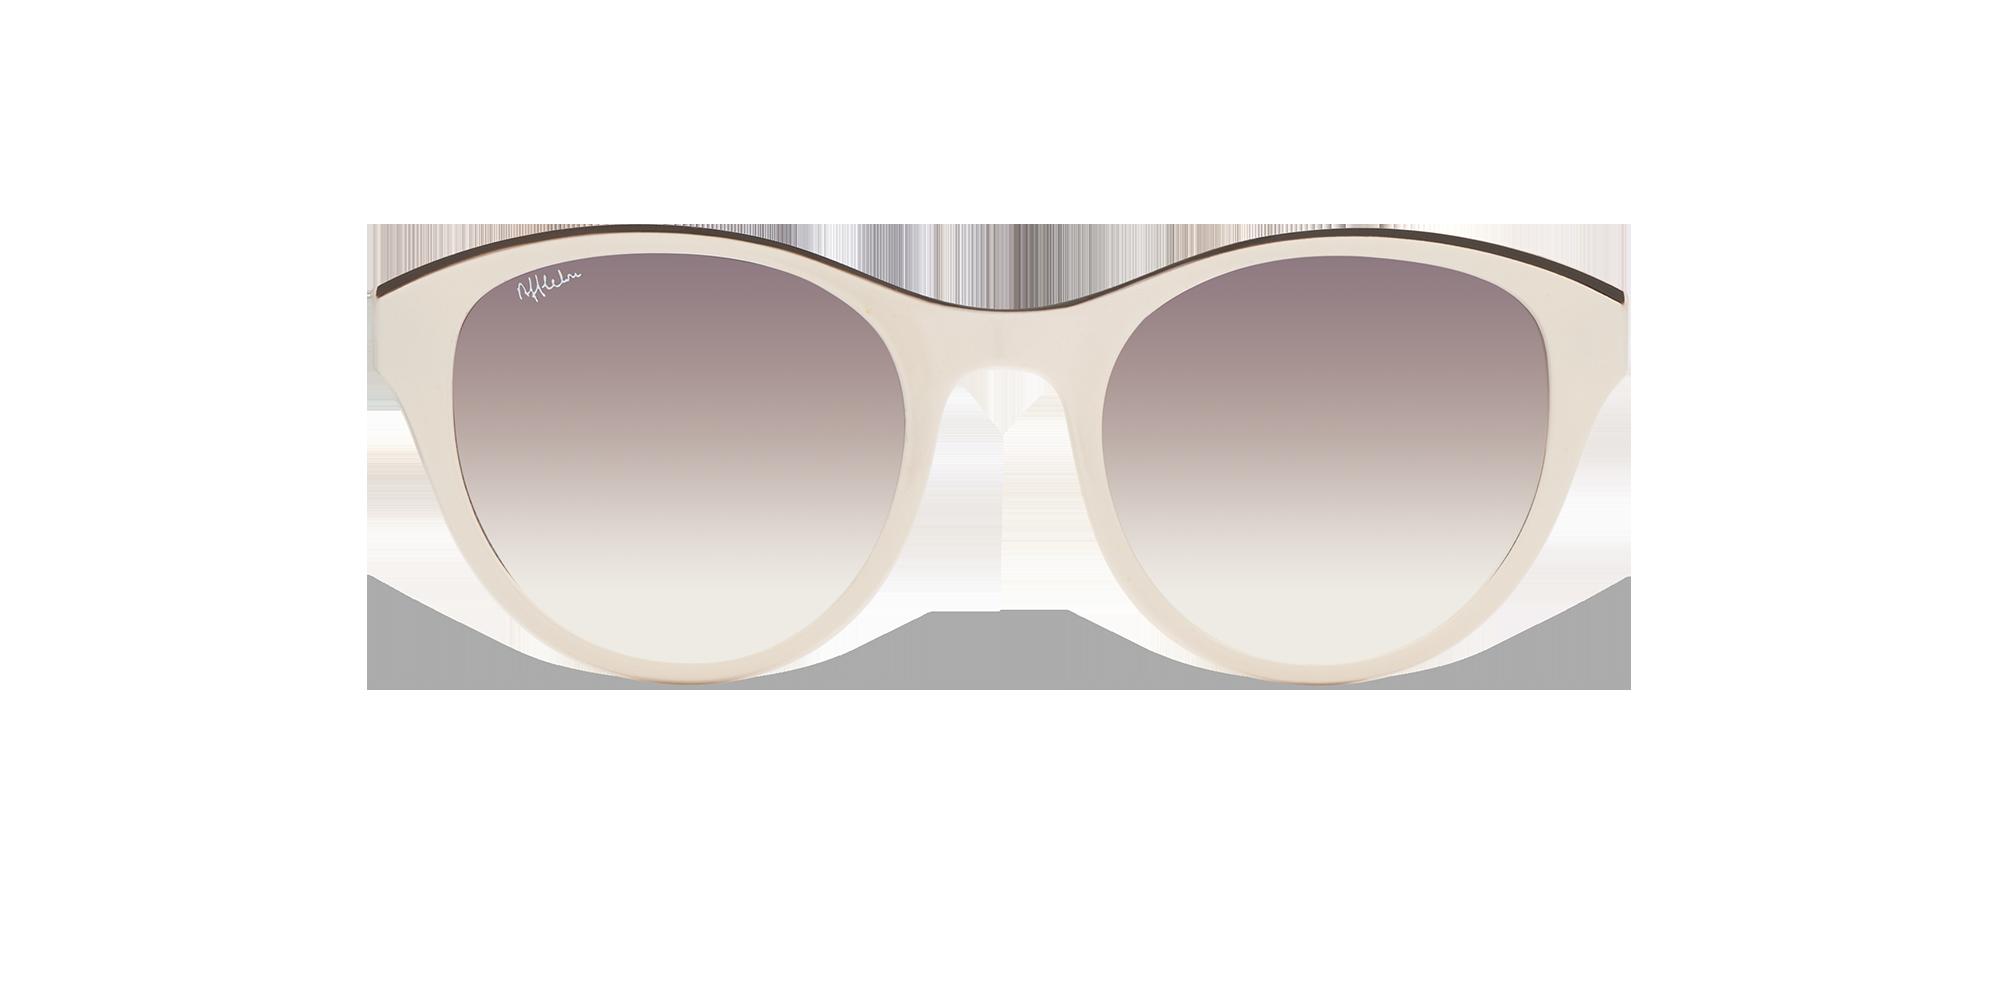 afflelou/france/products/smart_clip/clips_glasses/TMK37XLBG014919.png